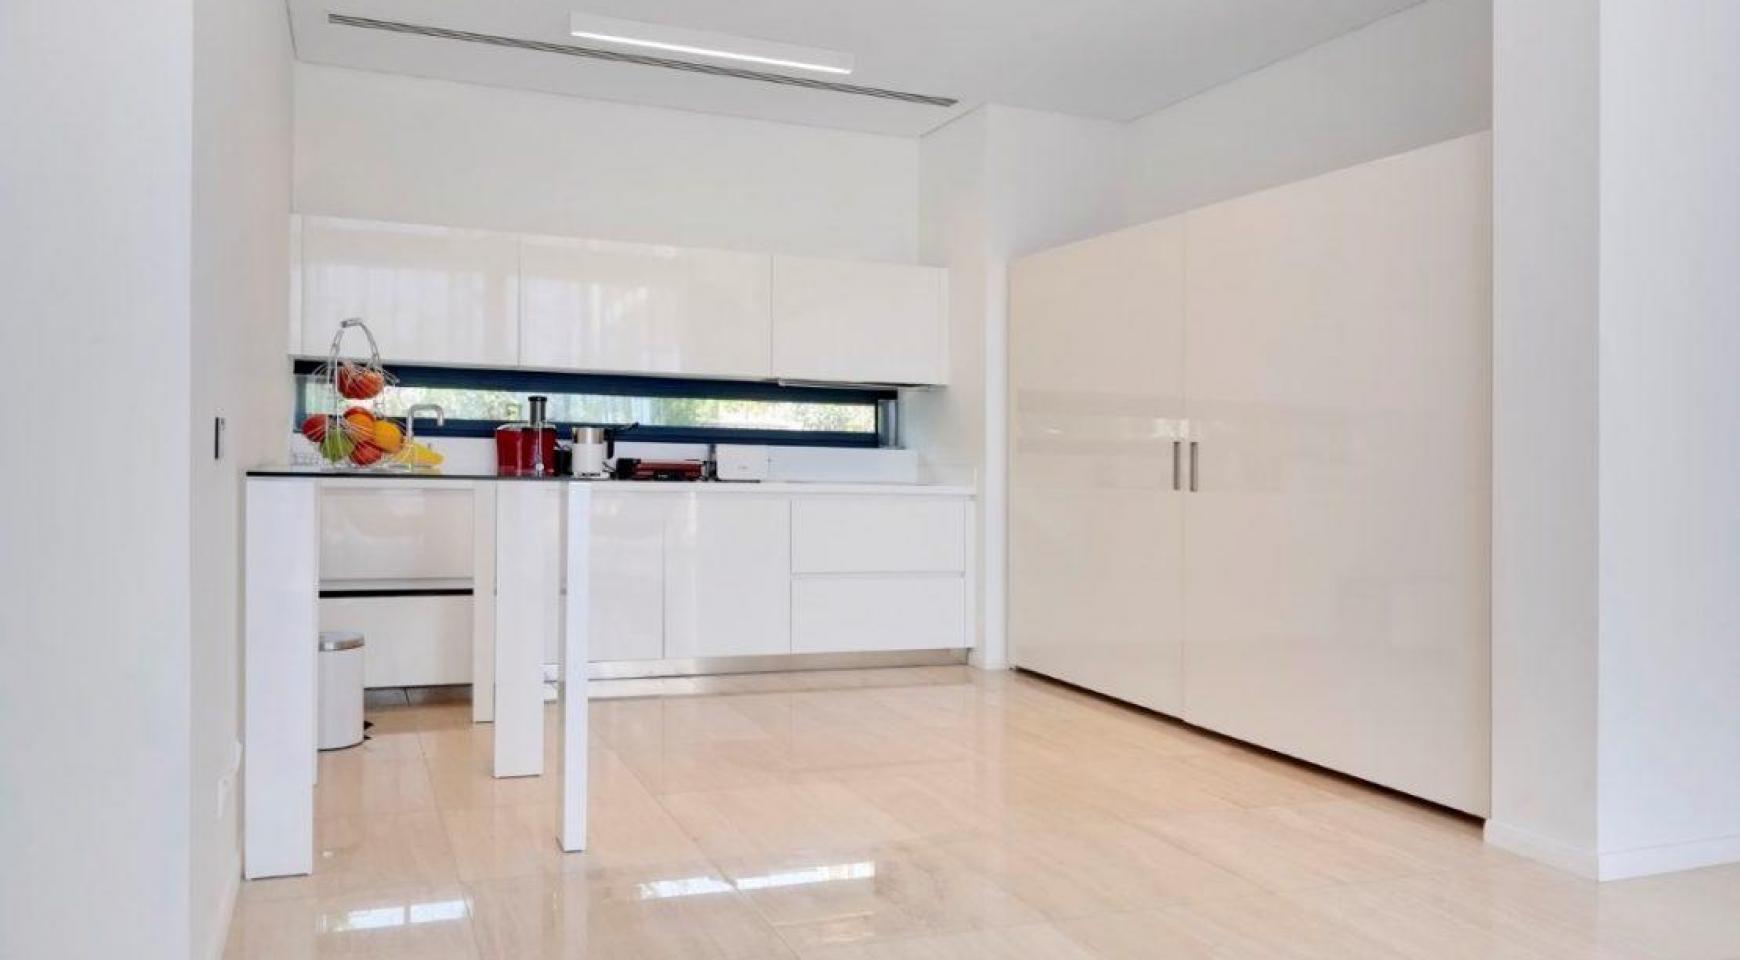 New Luxurious 4 Bedroom Villa in the Tourist Area - 24